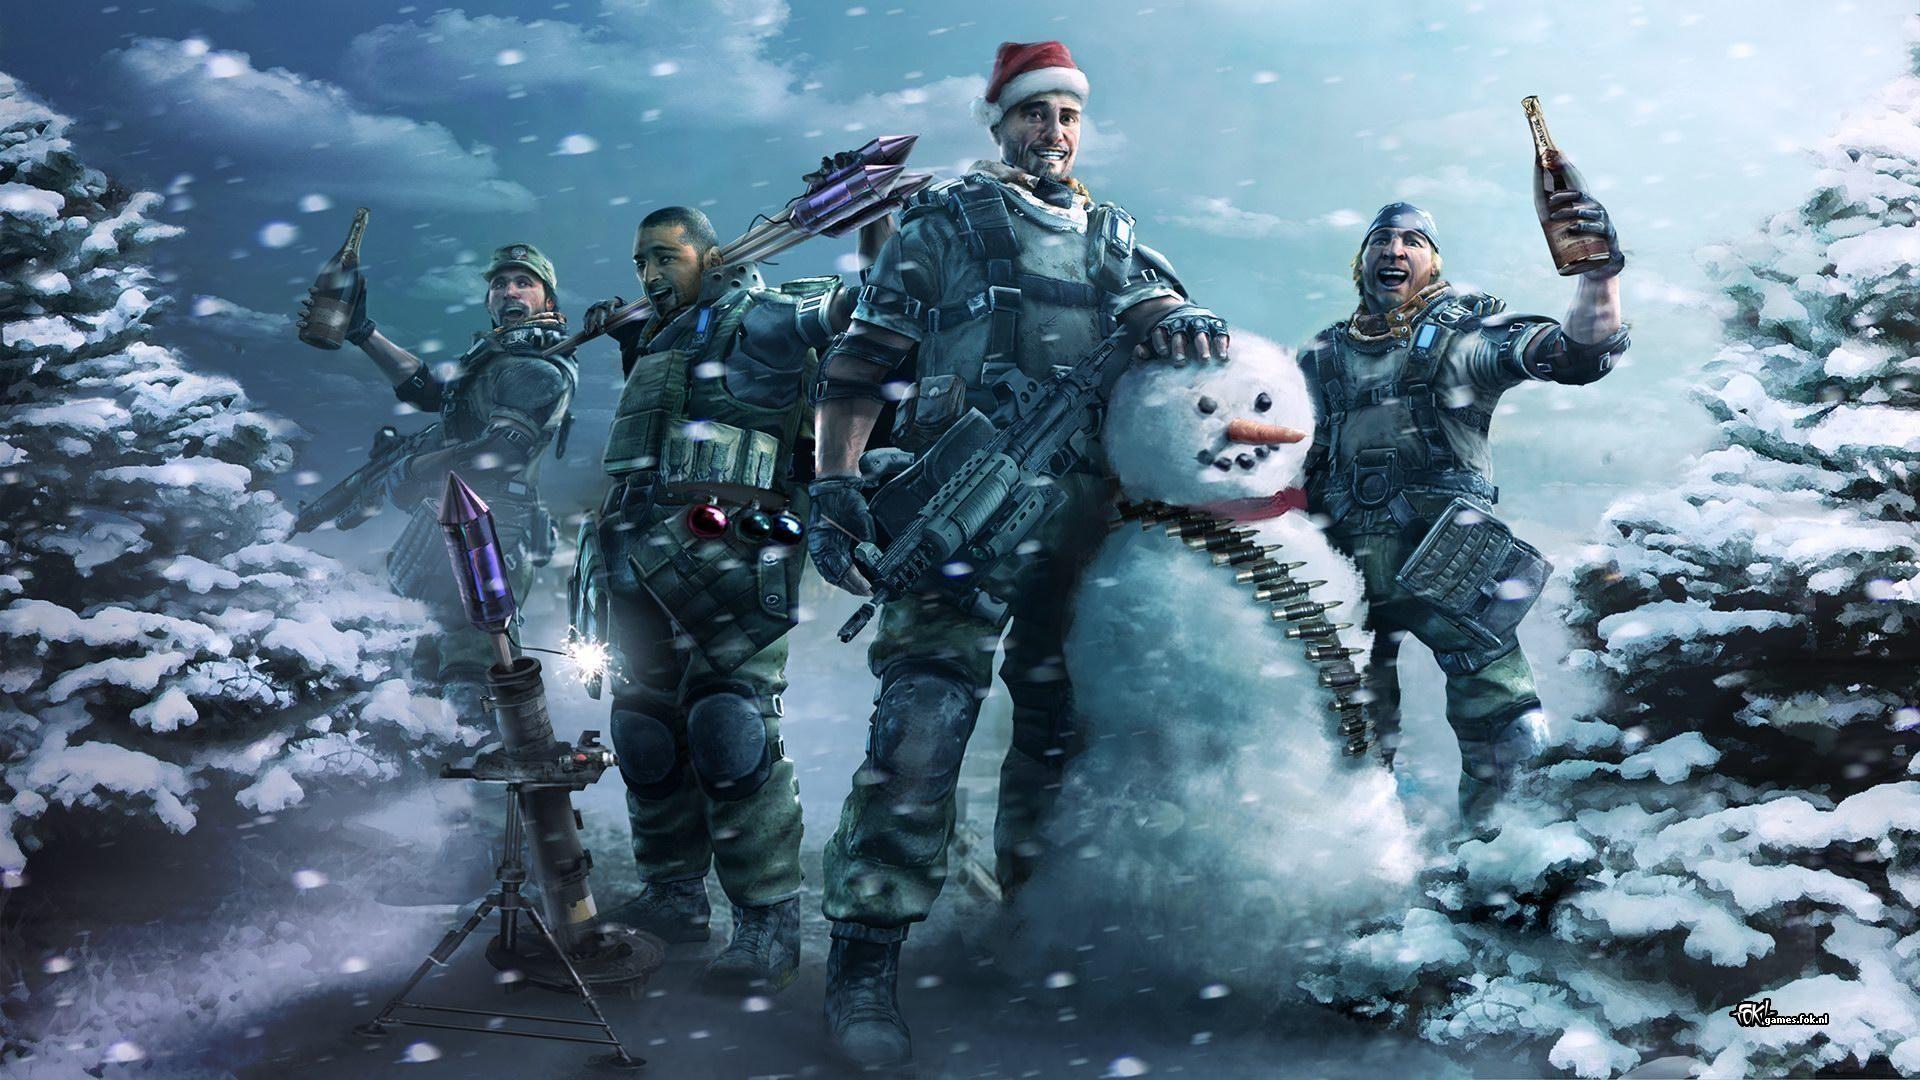 Adorable Killzone Snowman Soldiers Joy Snow Wallpaper Wallpaper ...